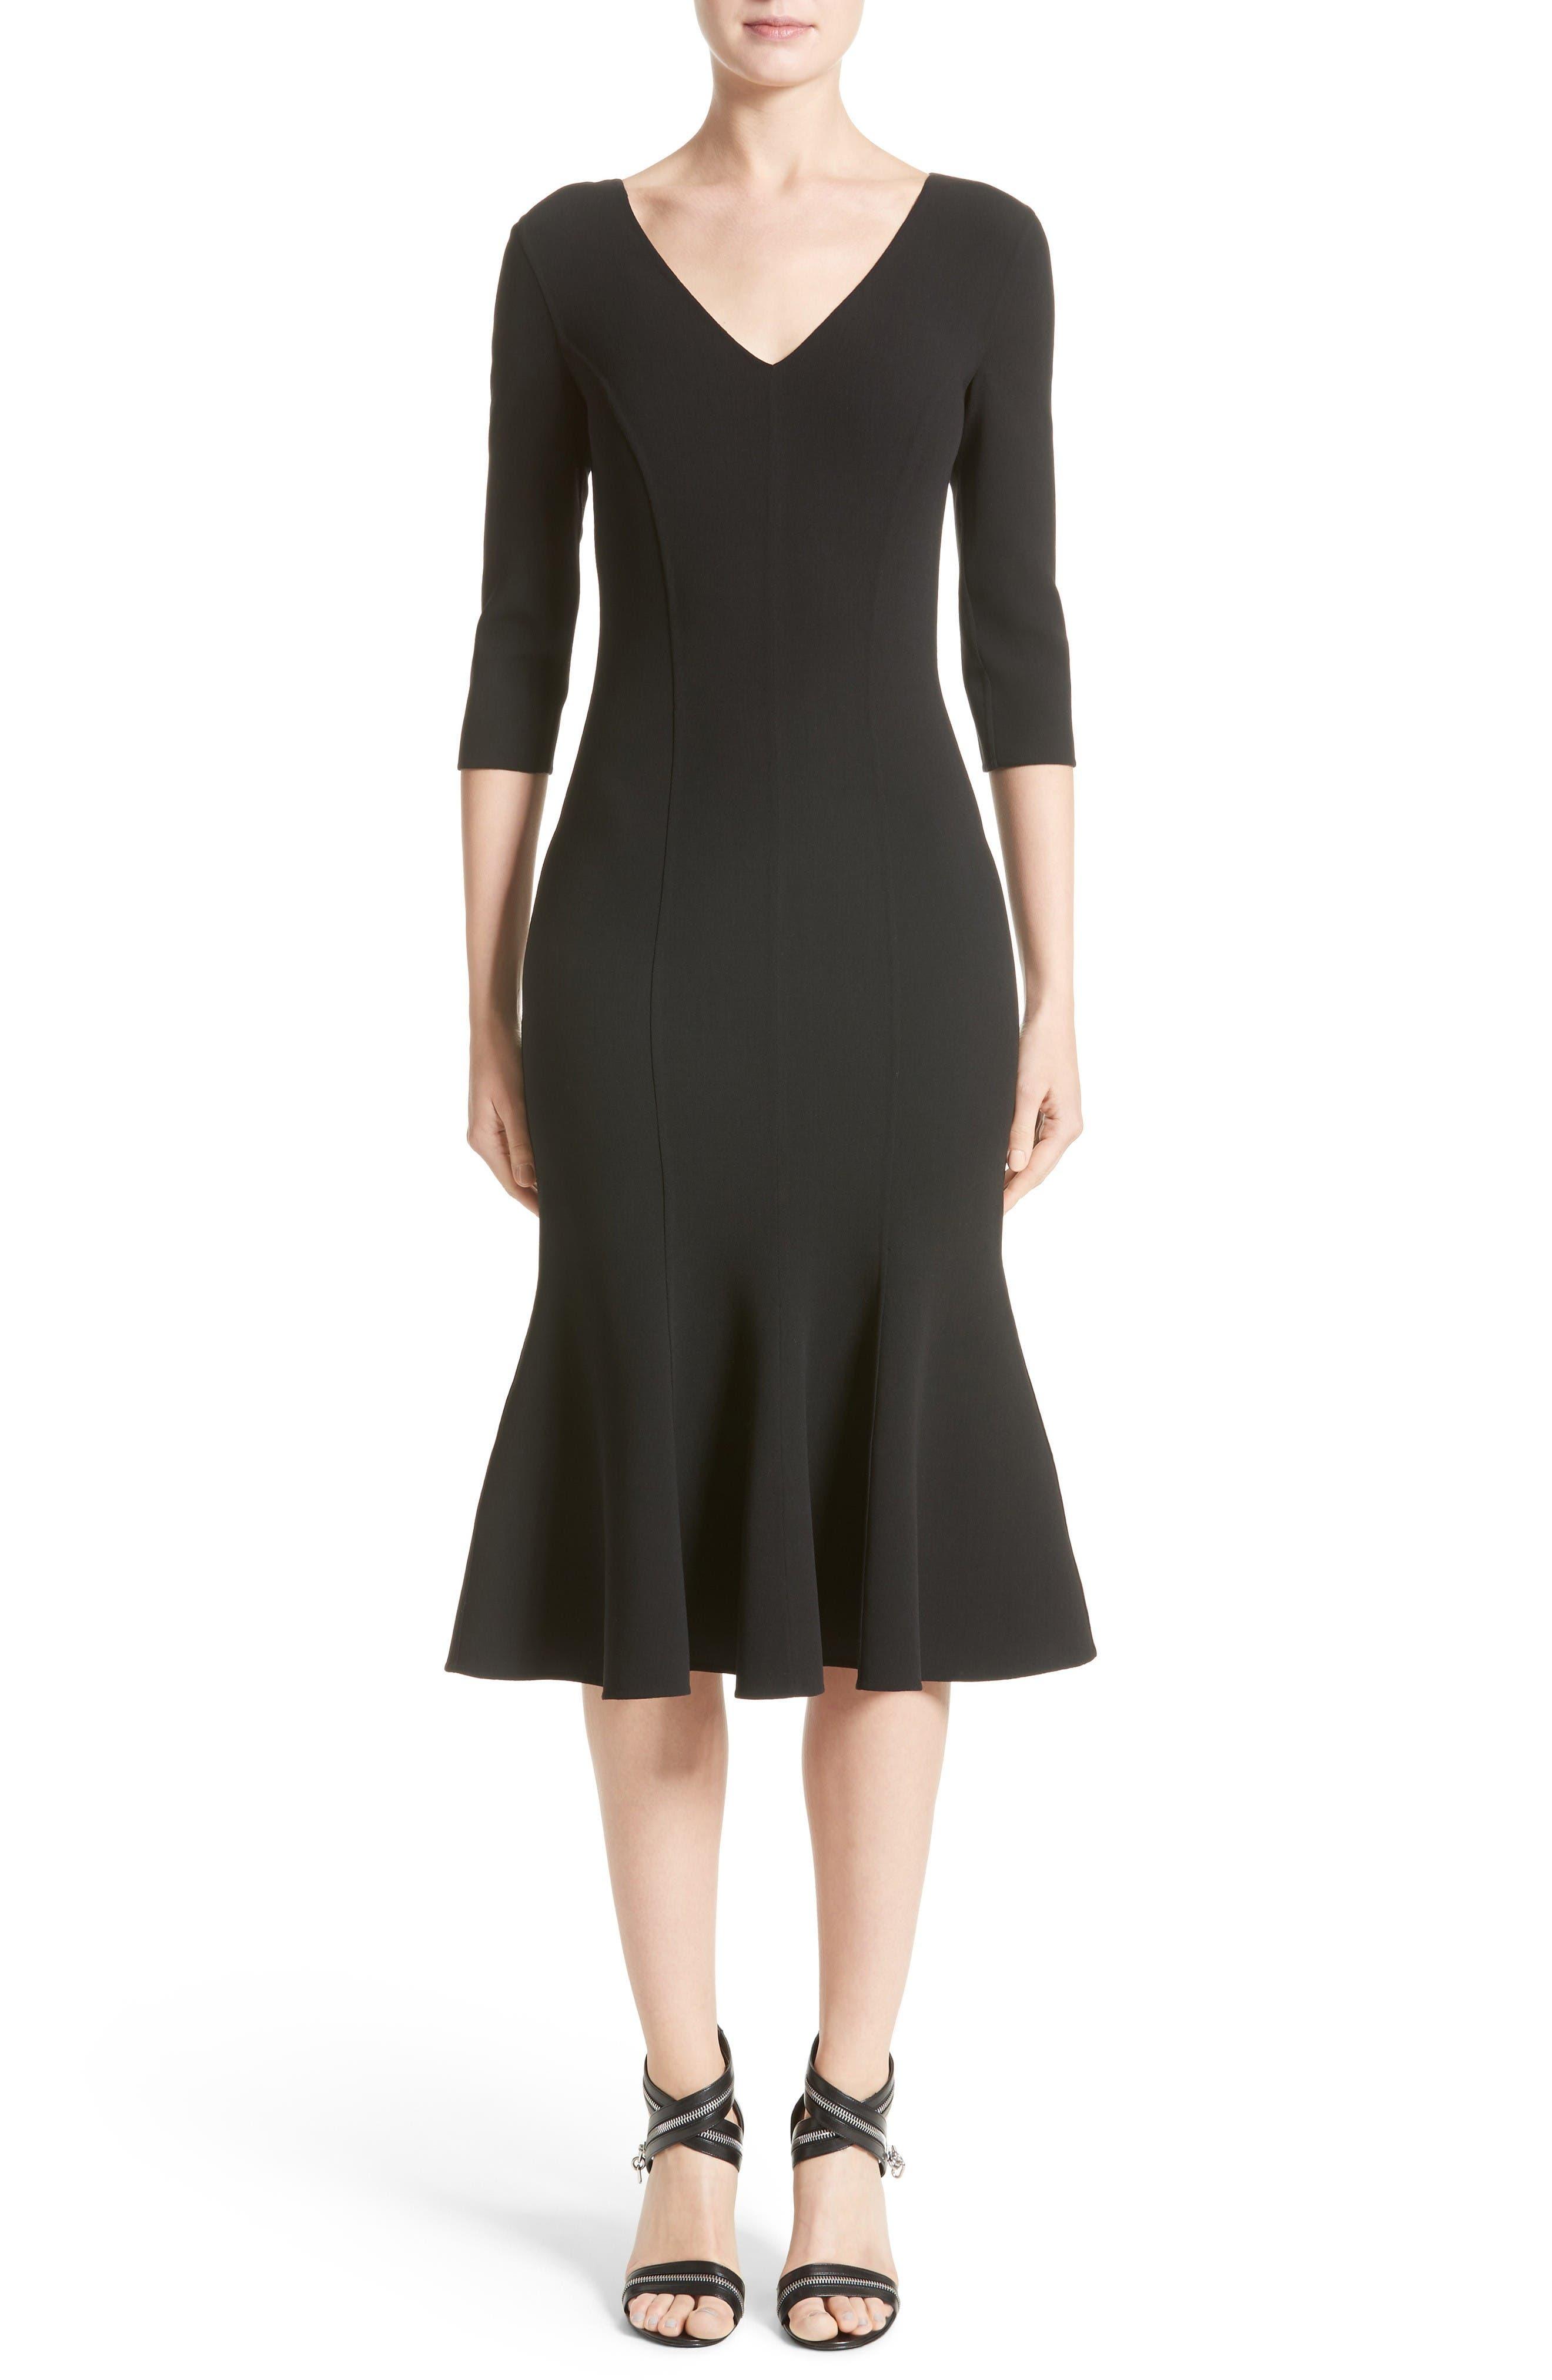 Main Image - Michael Kors Stretch Wool Crepe Flounce Dress